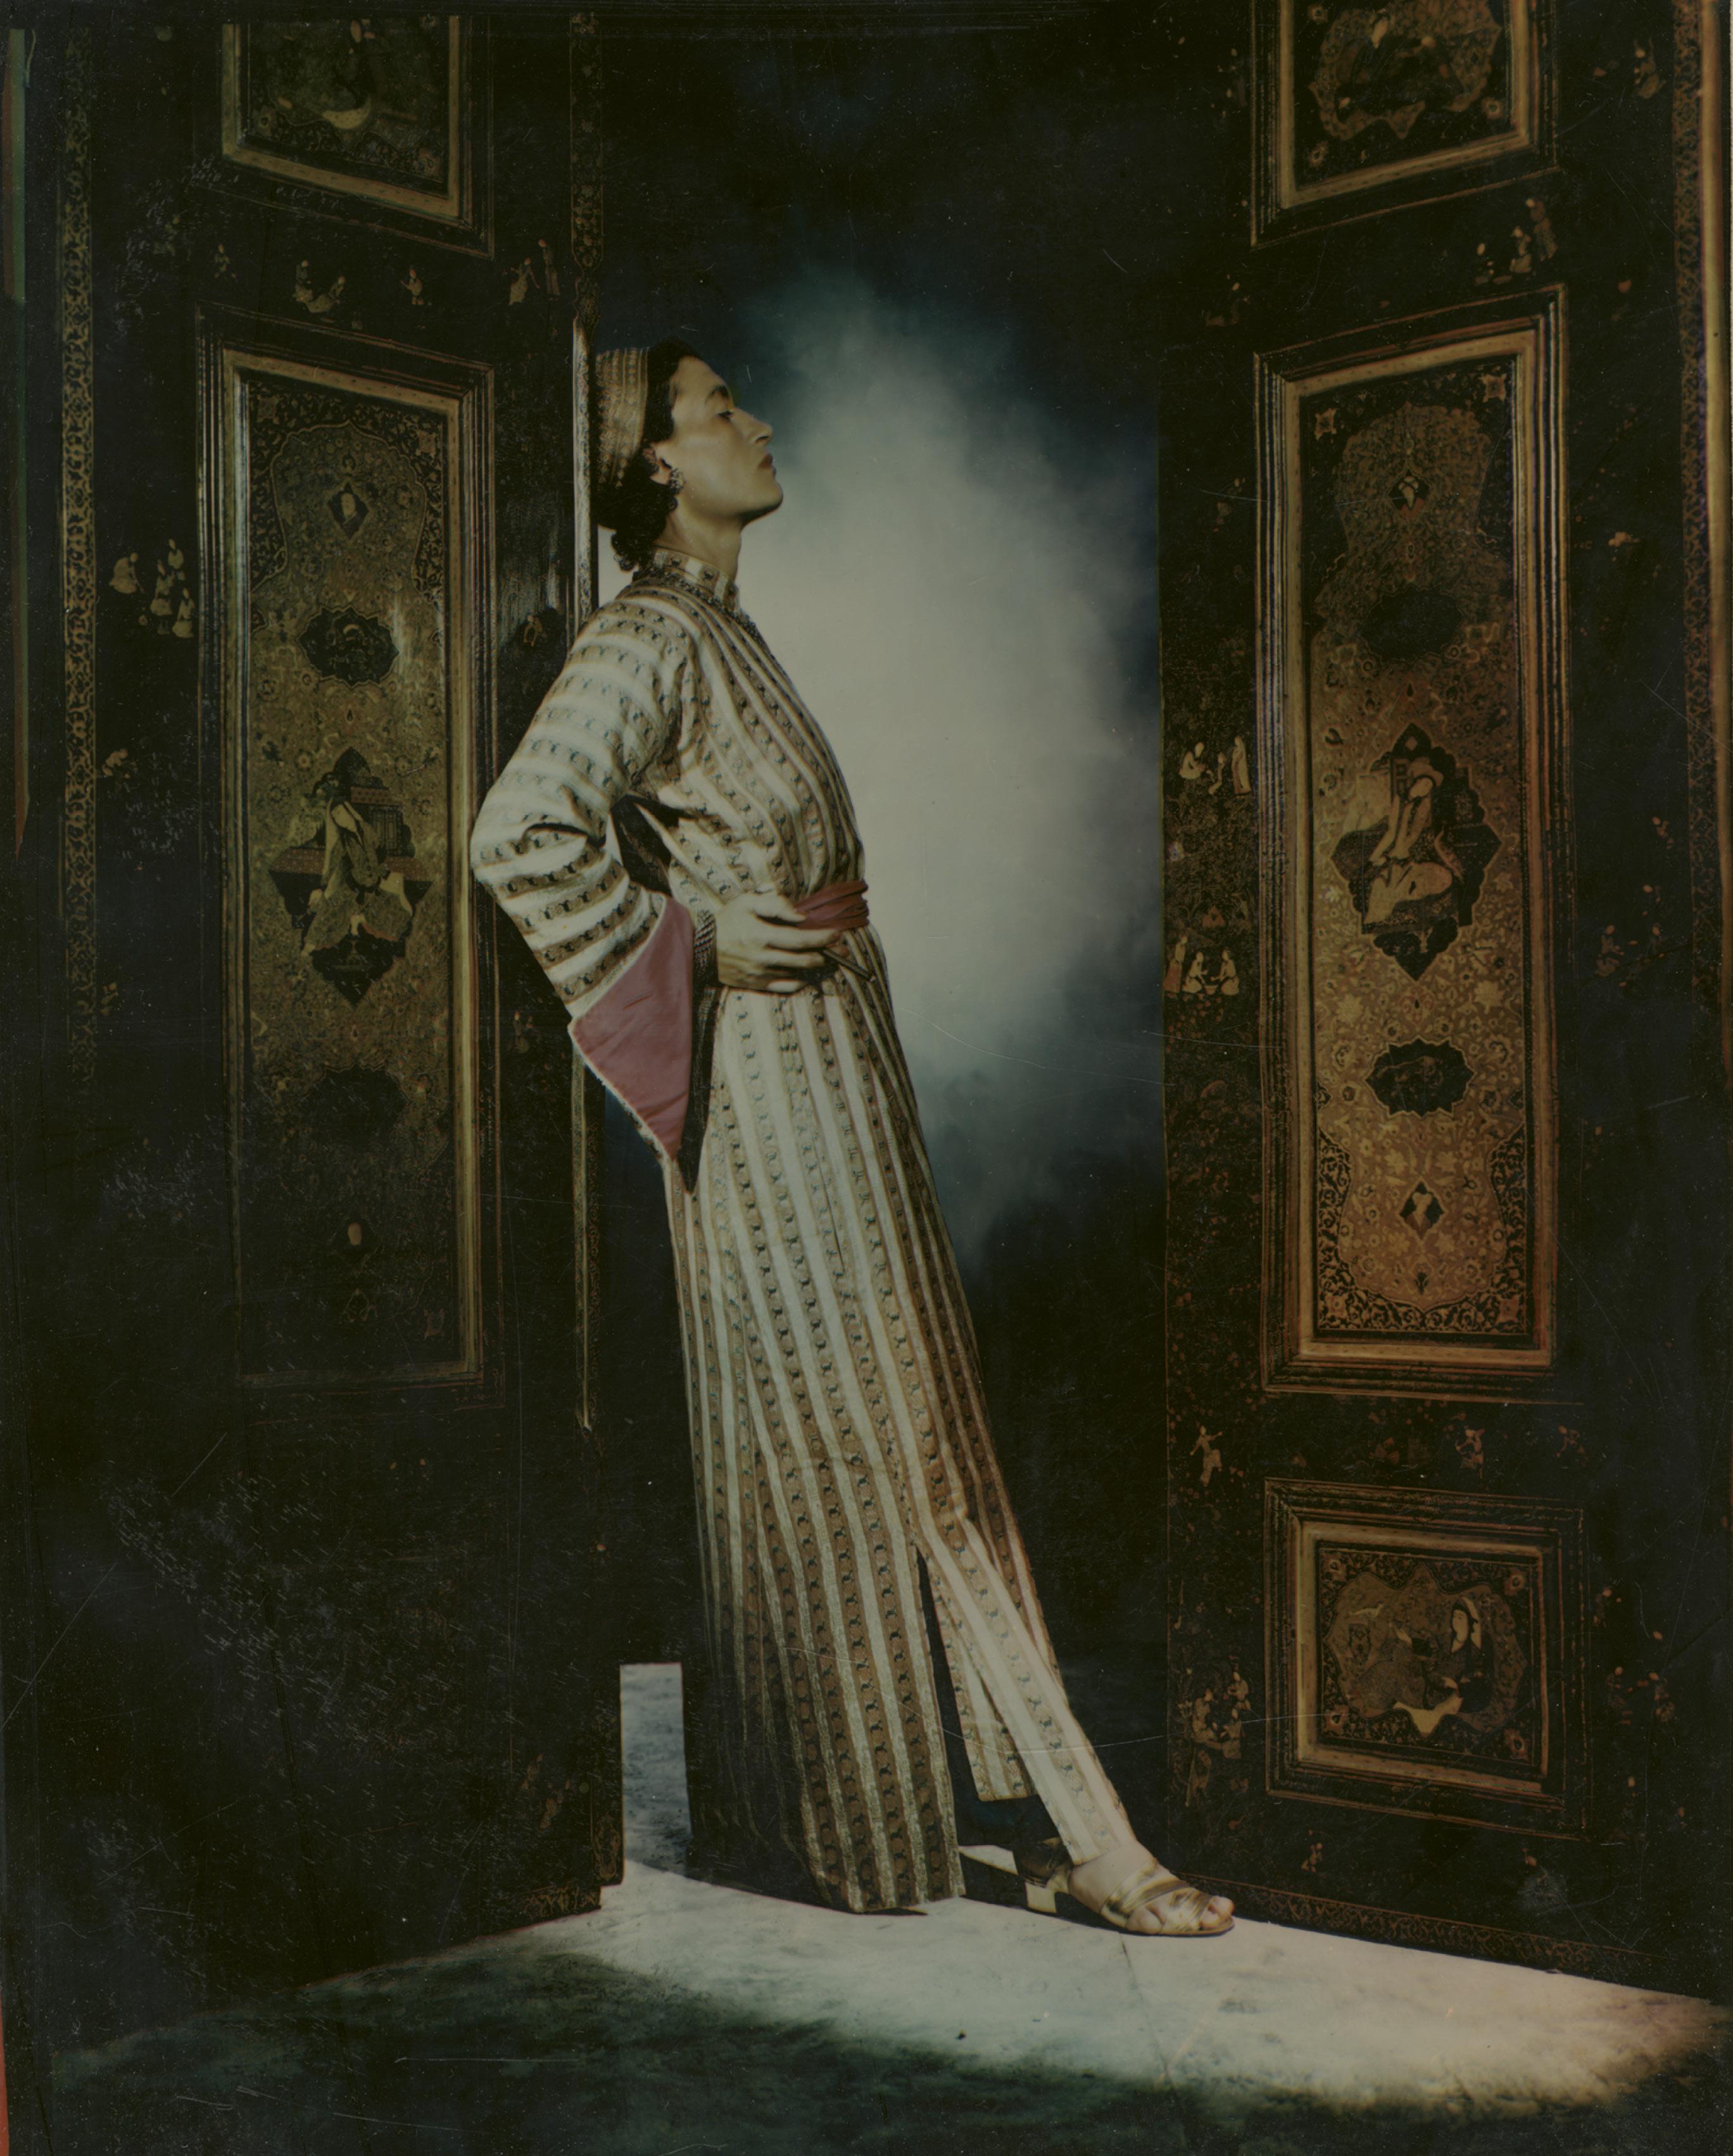 Gertrude Sanford Legendre—the internationally known globetrotter, socialite, and big-game hunter—as photographed by George Platt Lynes for Harper's Bazaar in 1938